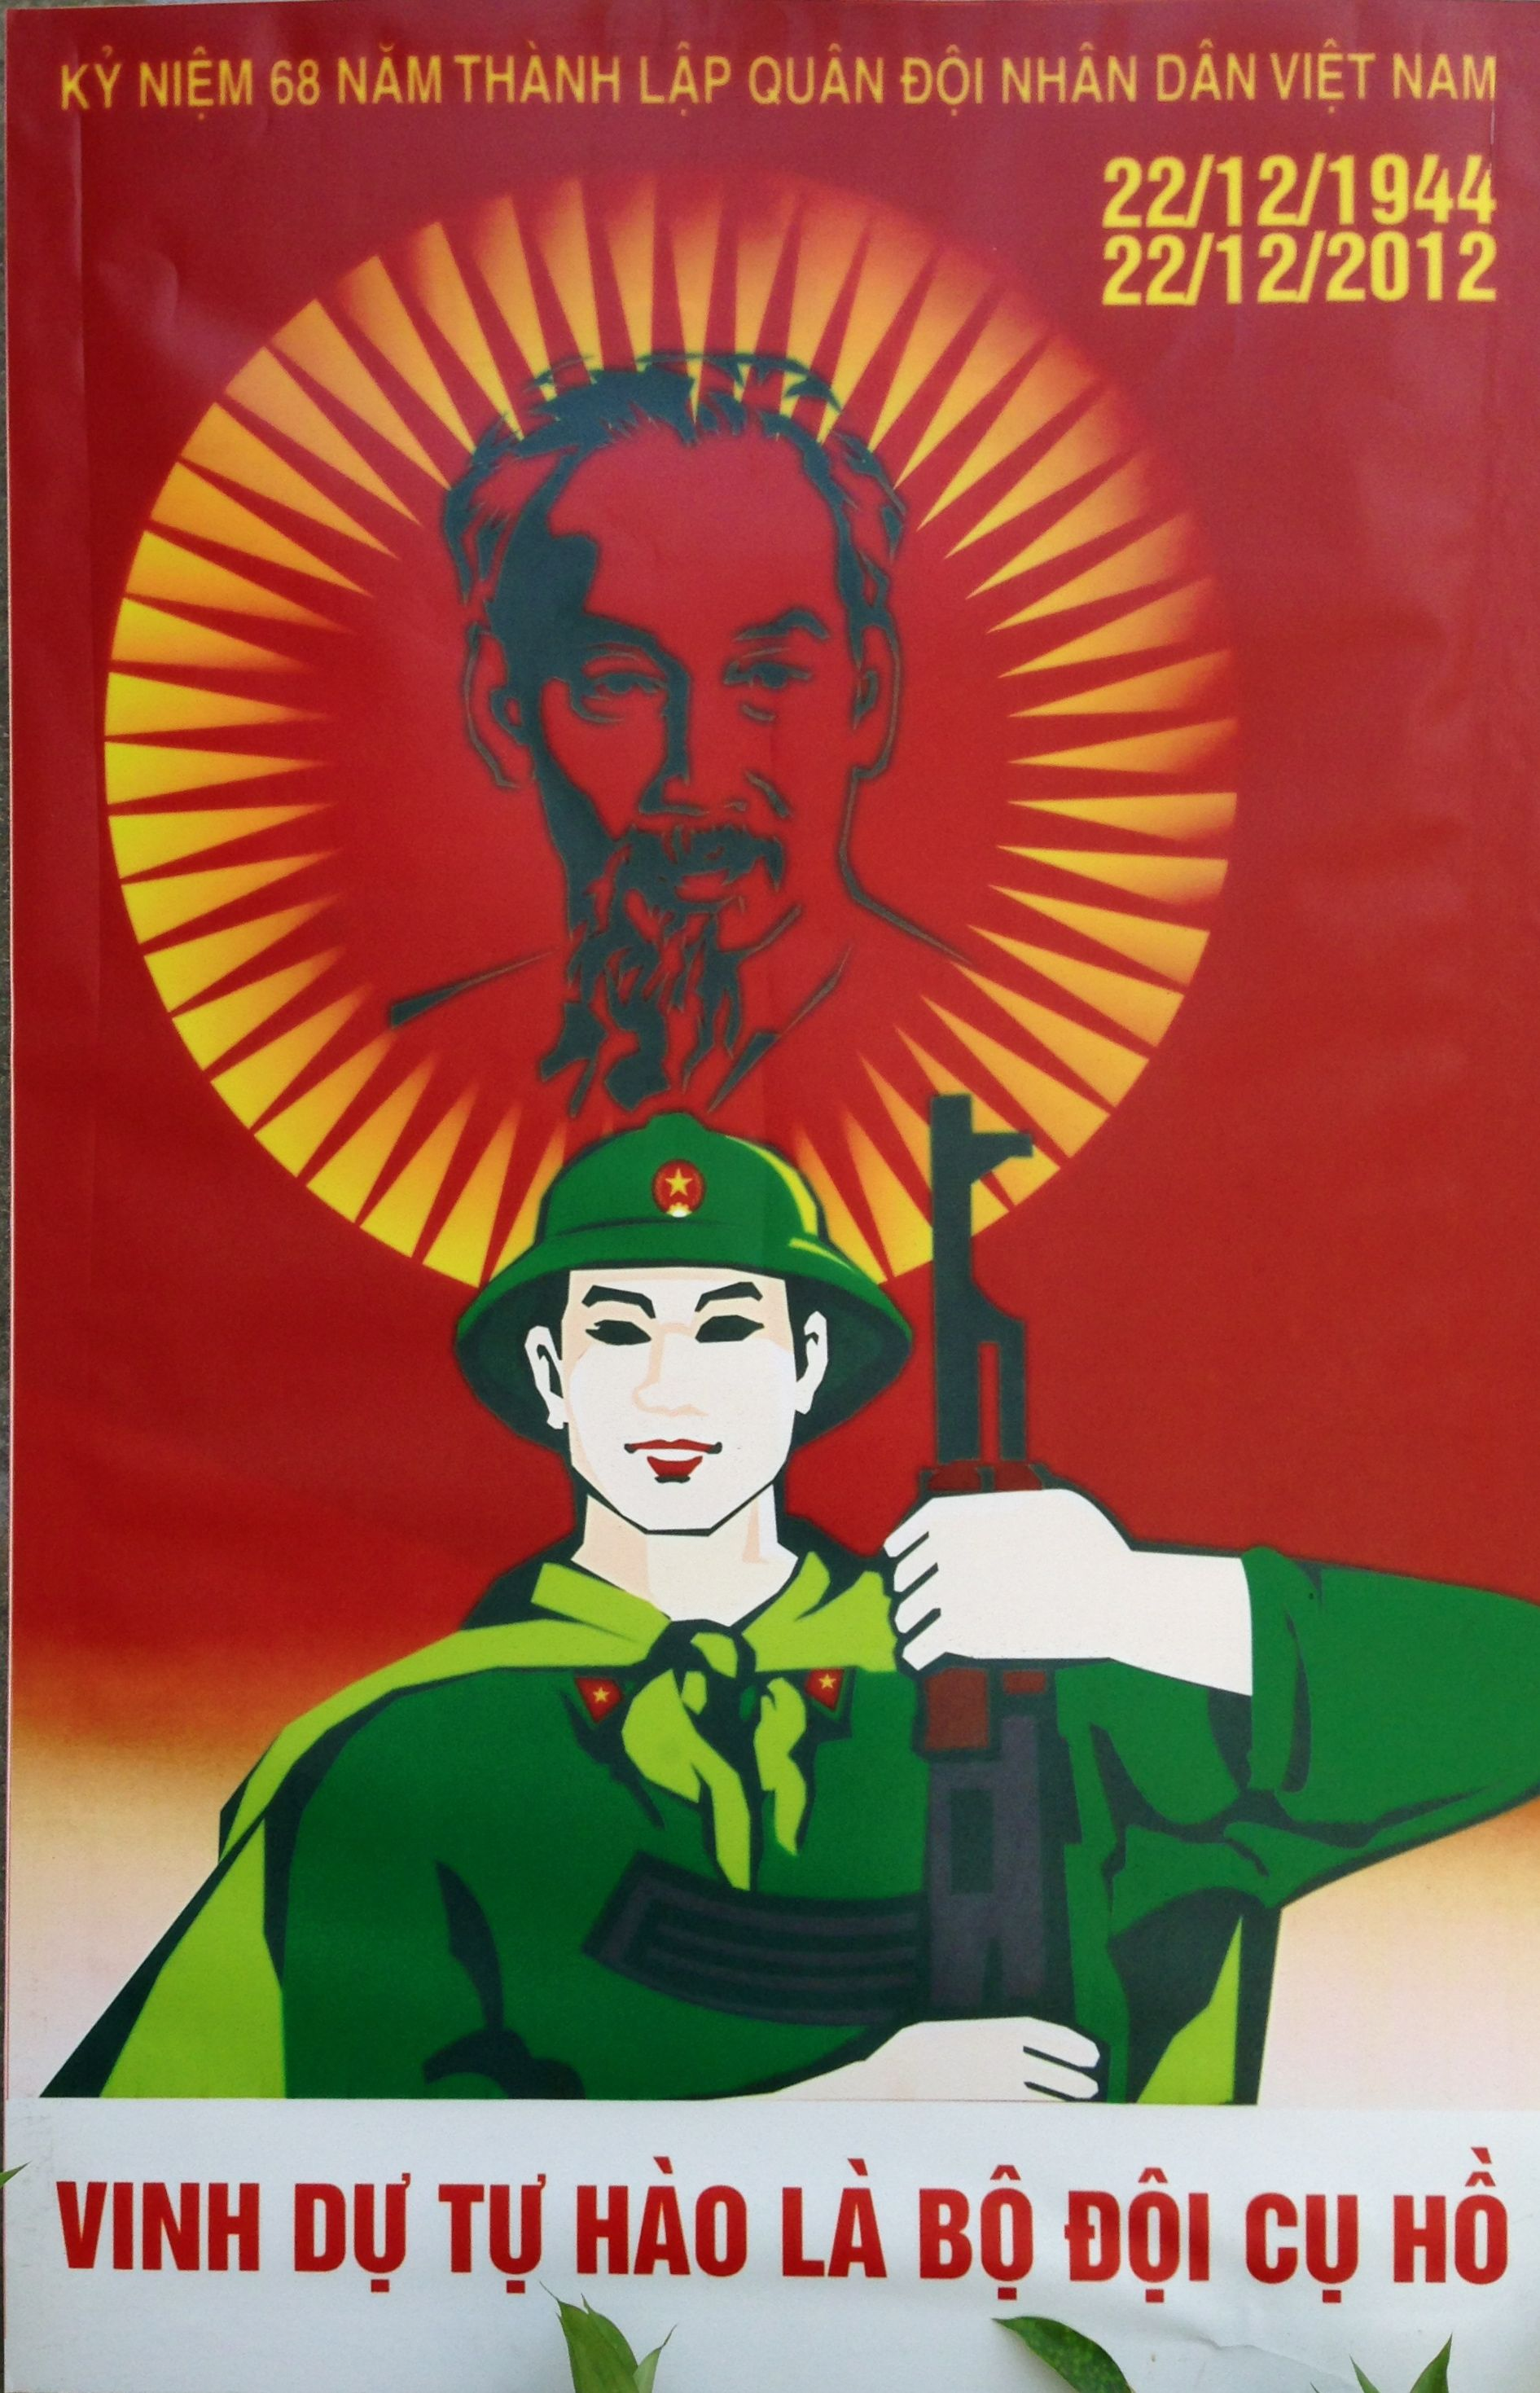 The fall of Saigon 30 april 1975 | Diversity | Pinterest ...